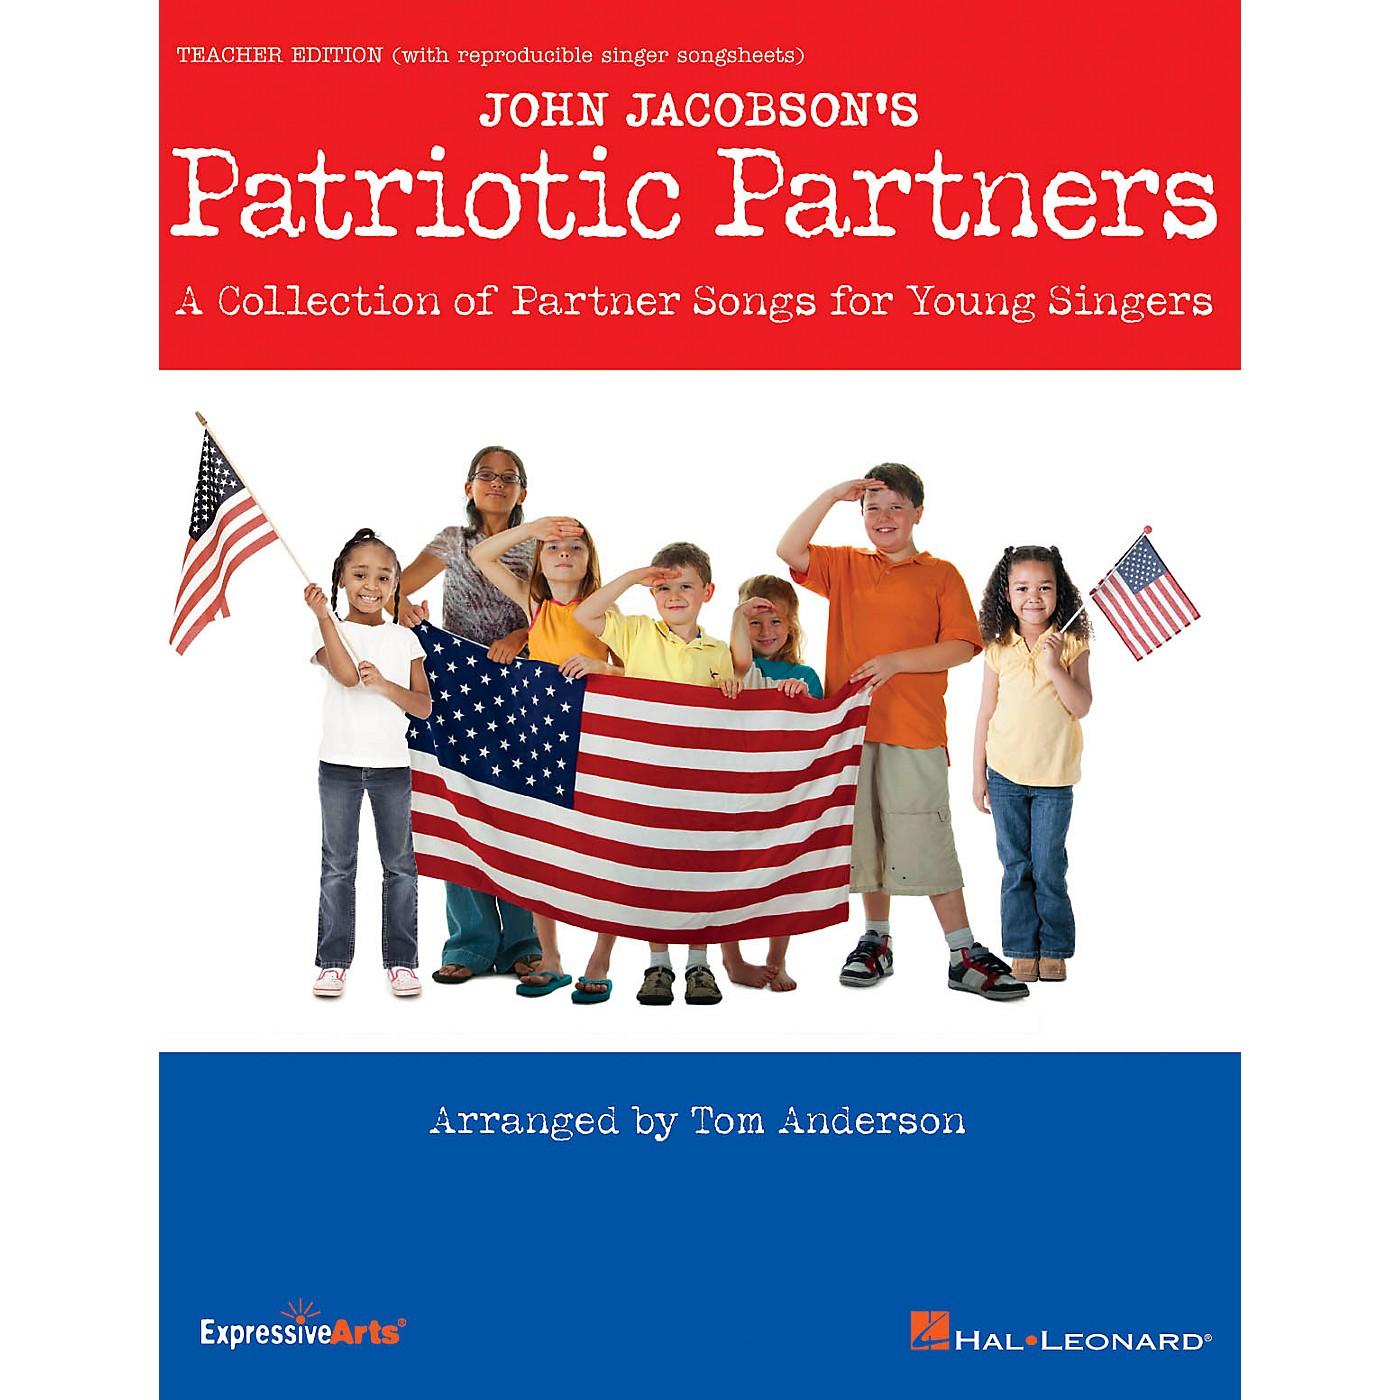 Hal Leonard Patriotic Partners Performance/Accompaniment CD Arranged by Tom Anderson thumbnail